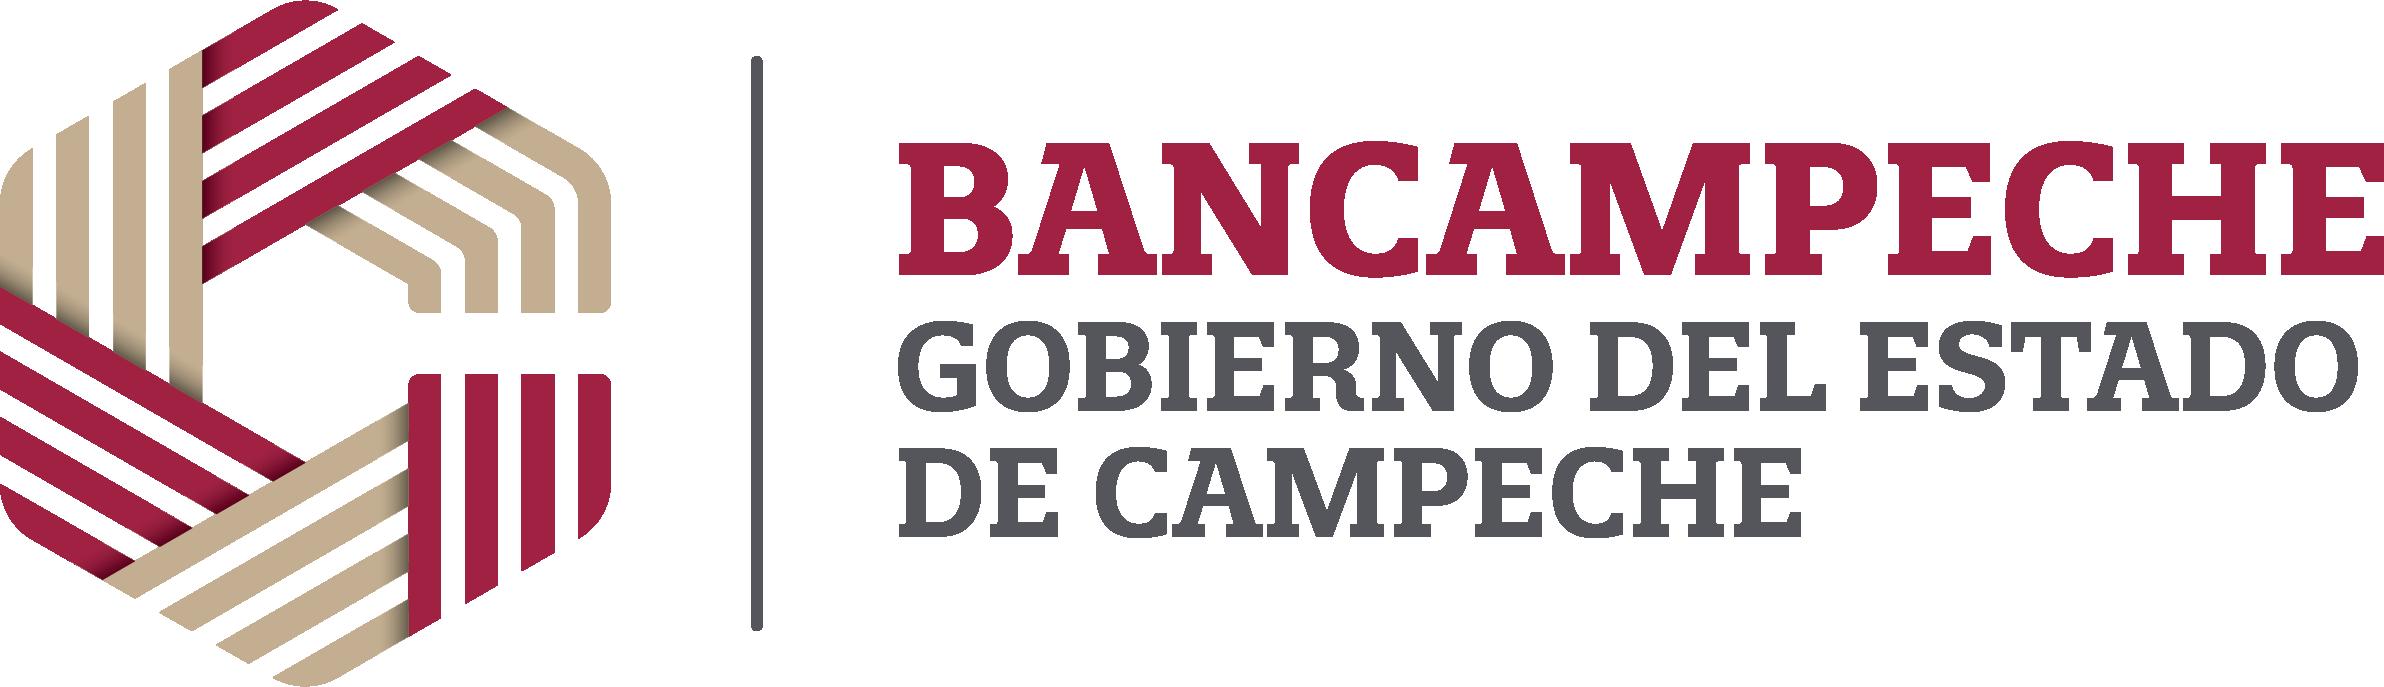 BANCAMPECHE